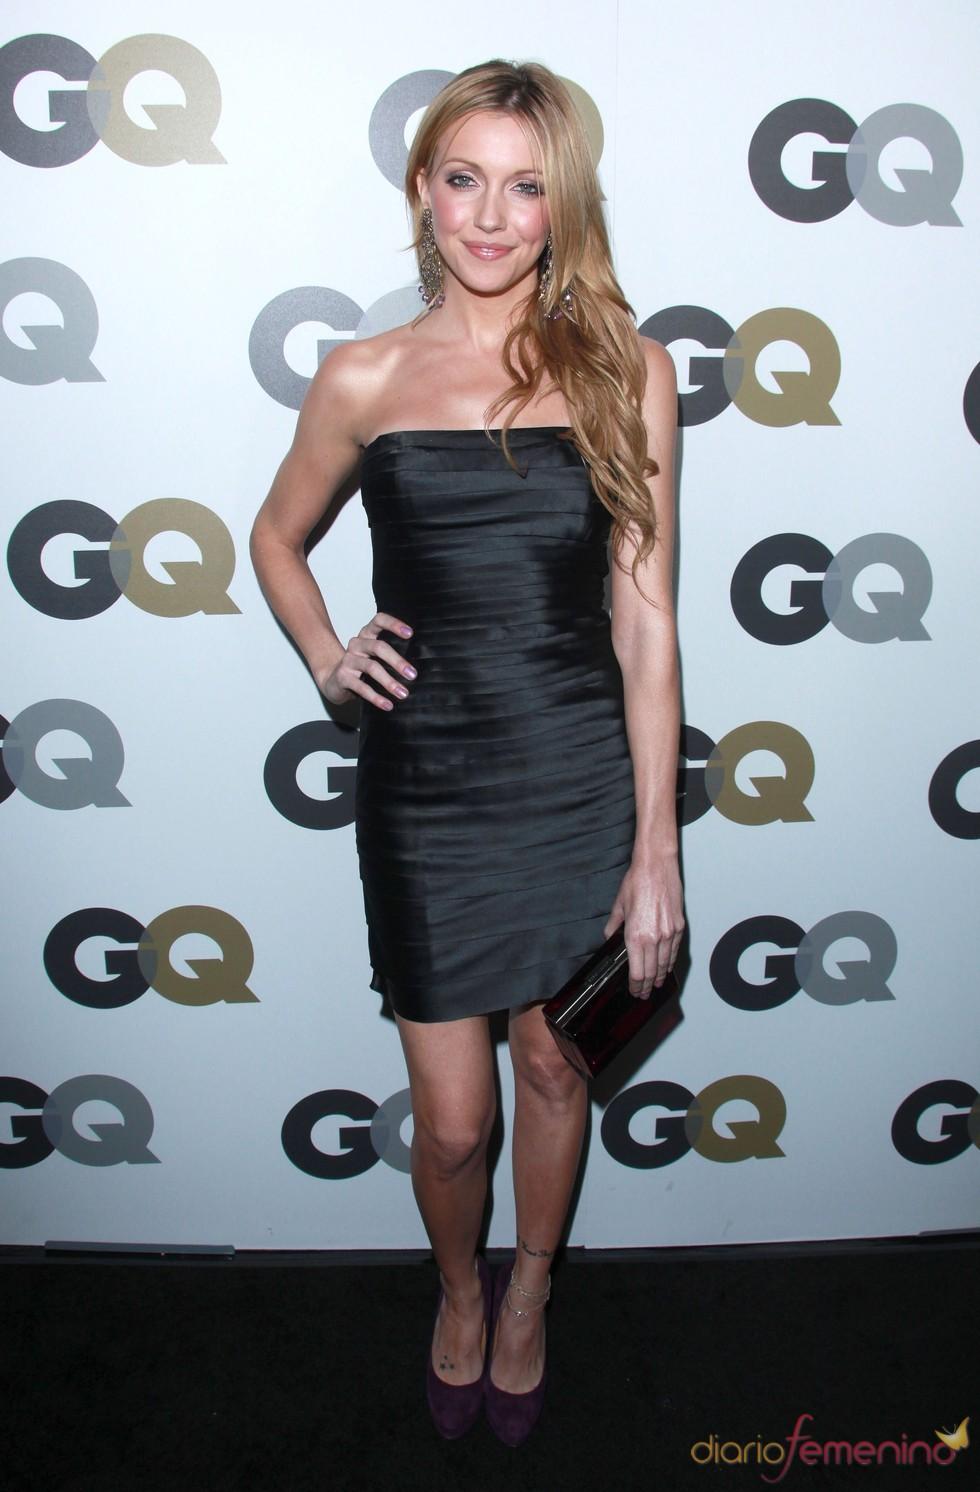 Katie Cassidy en la Fiesta GQ 2010